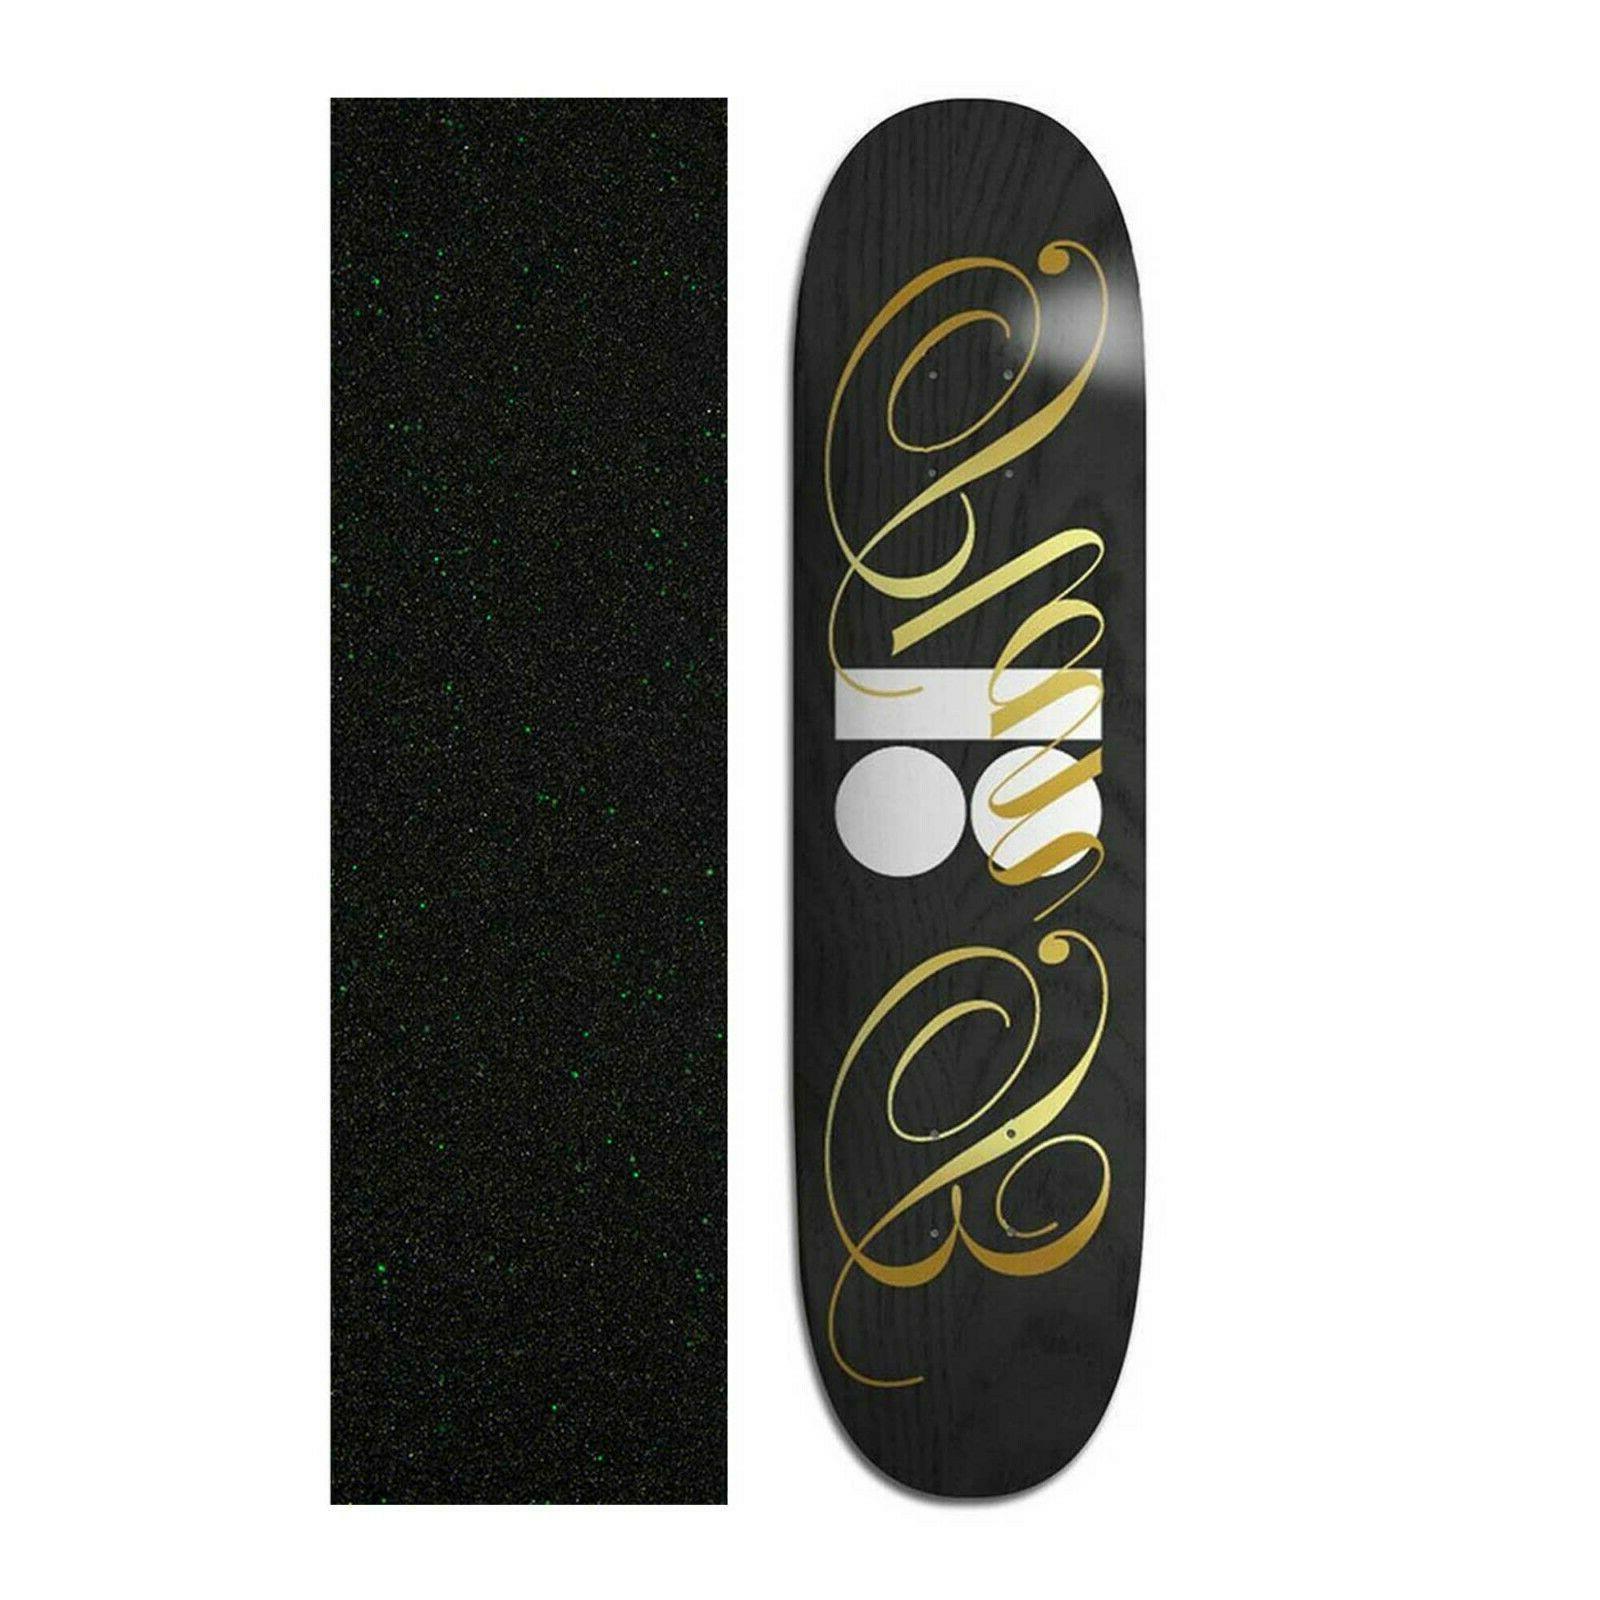 8 125 team og intent tea skateboard